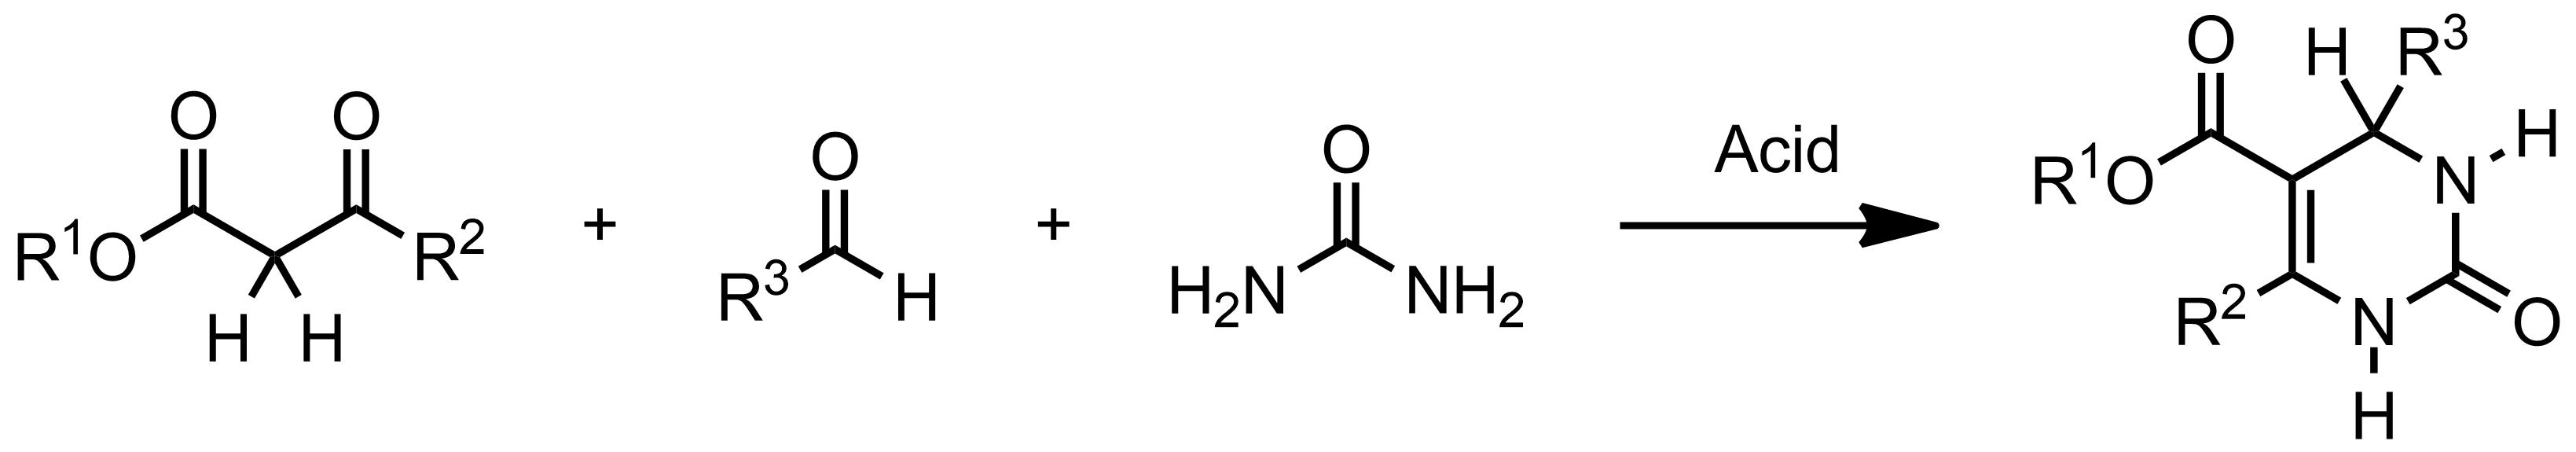 Schematic representation of the Biginelli Reaction.